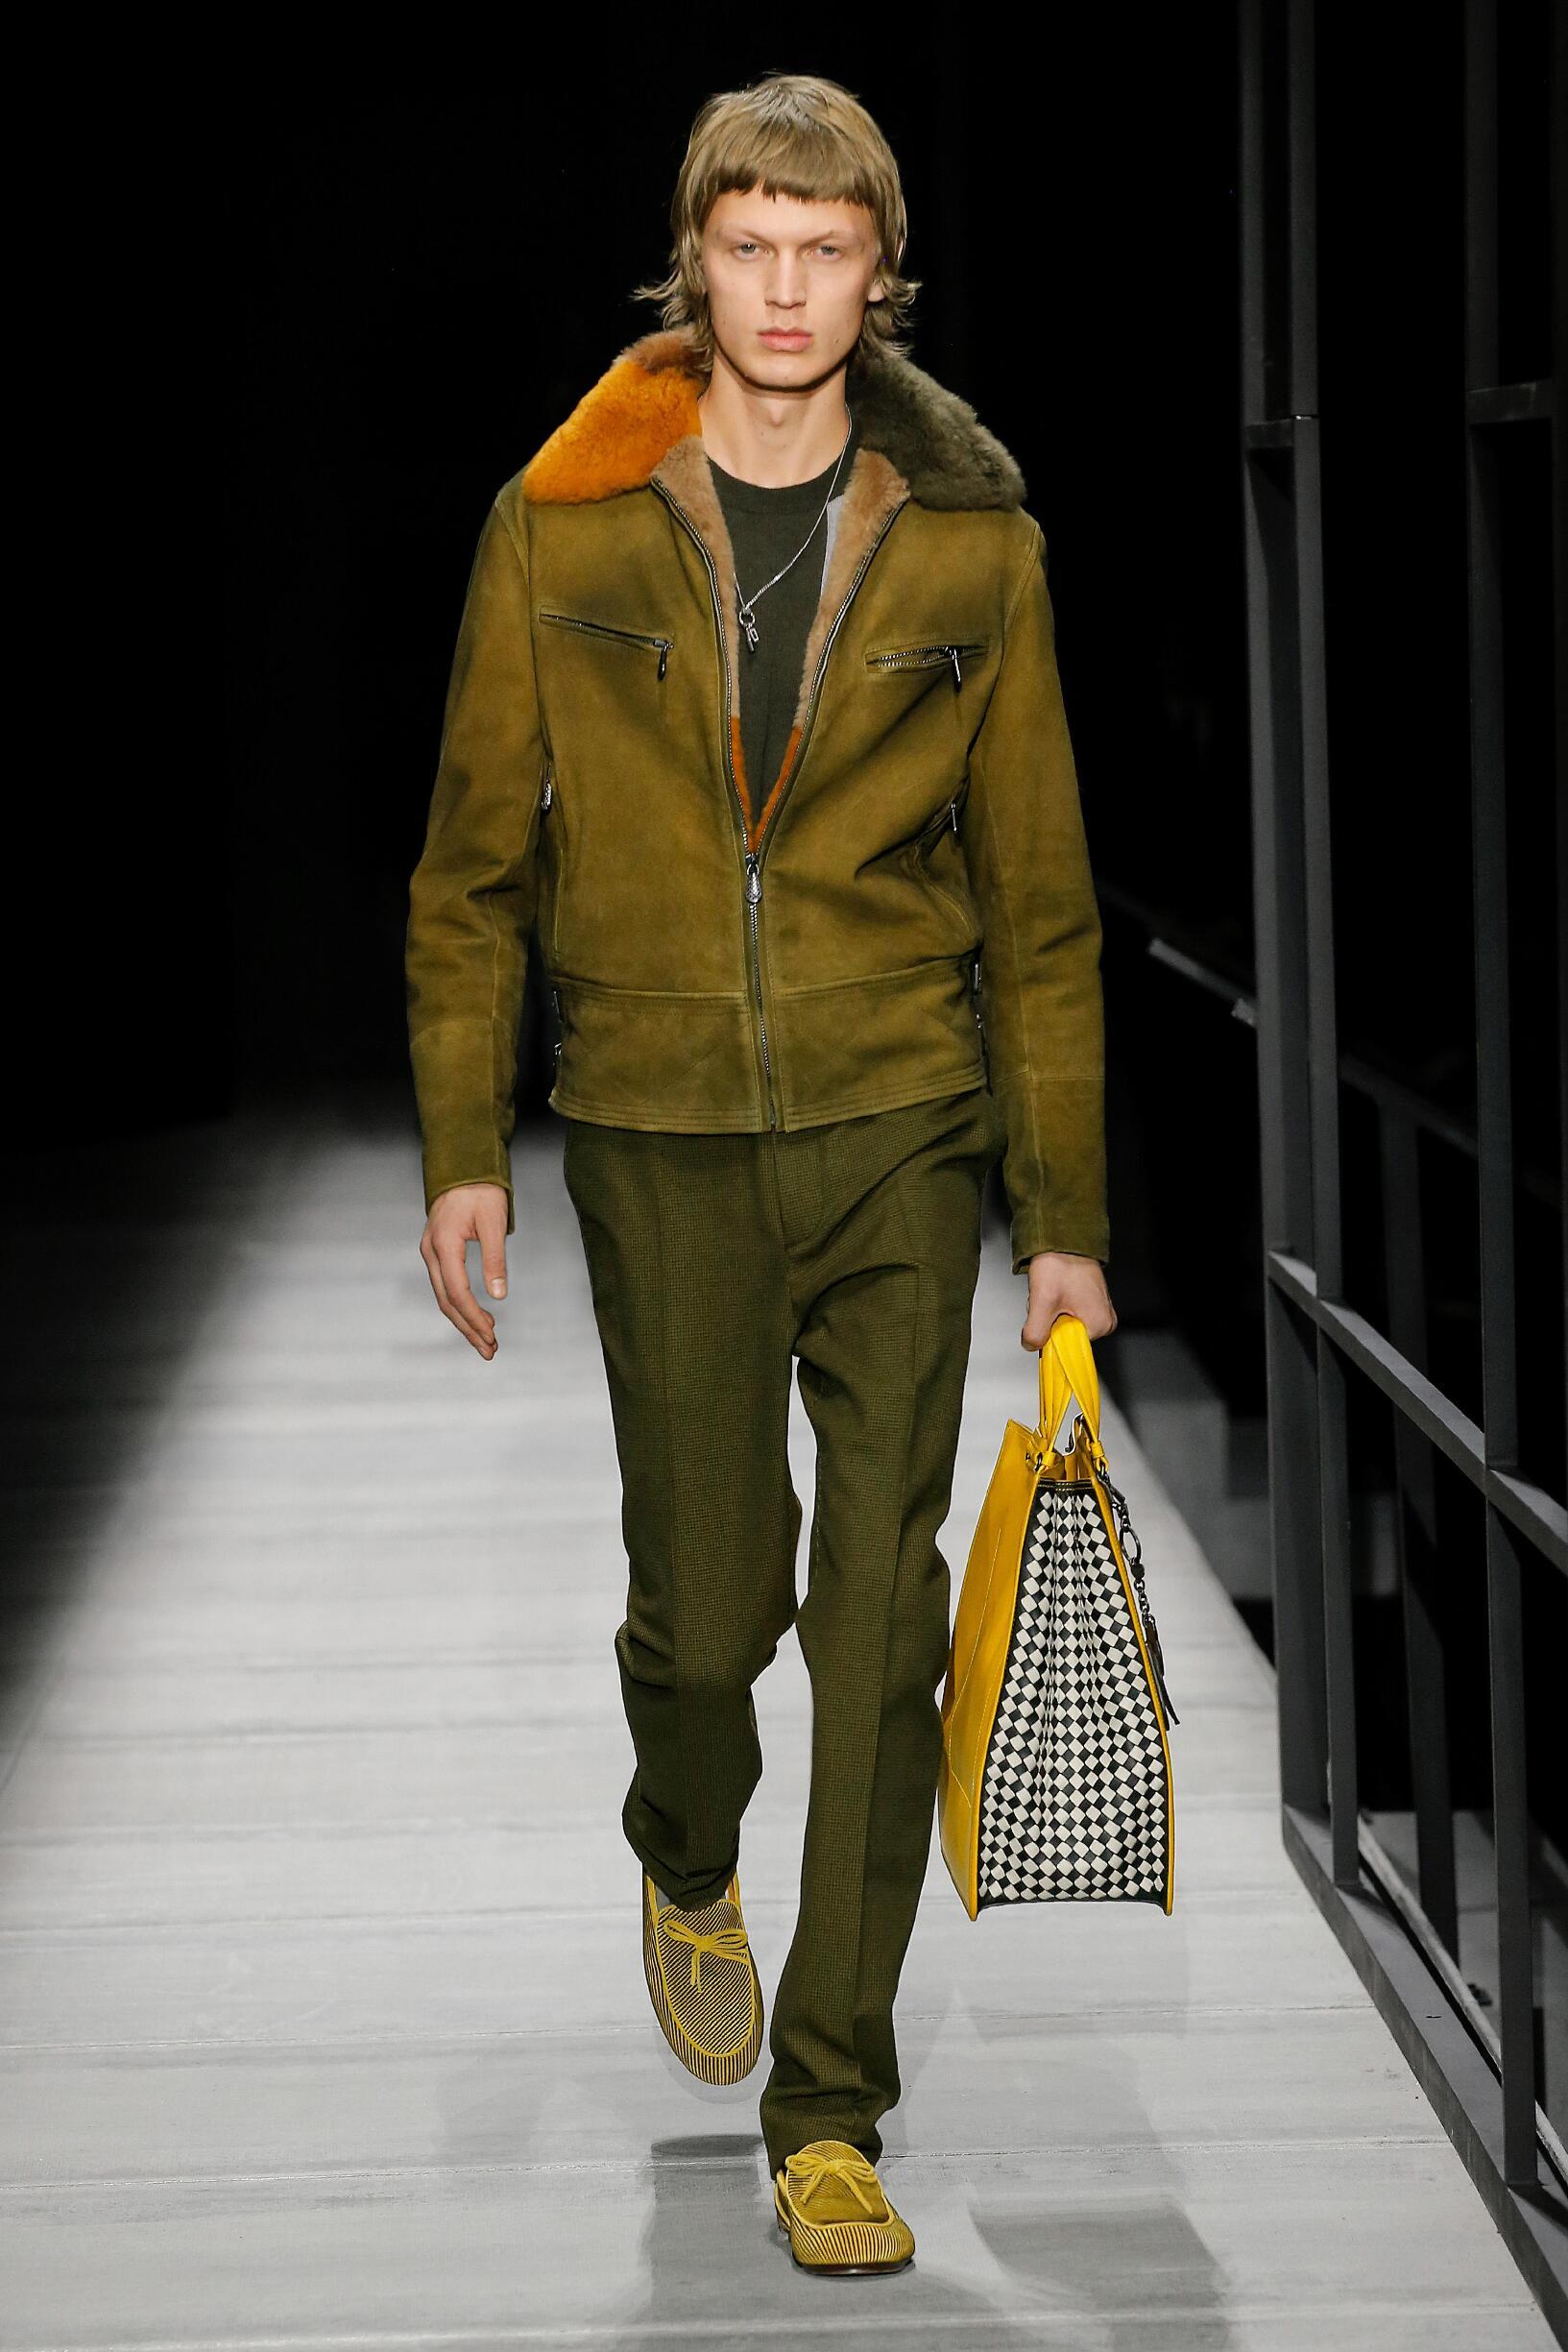 Fashion Man Model Bottega Veneta Catwalk